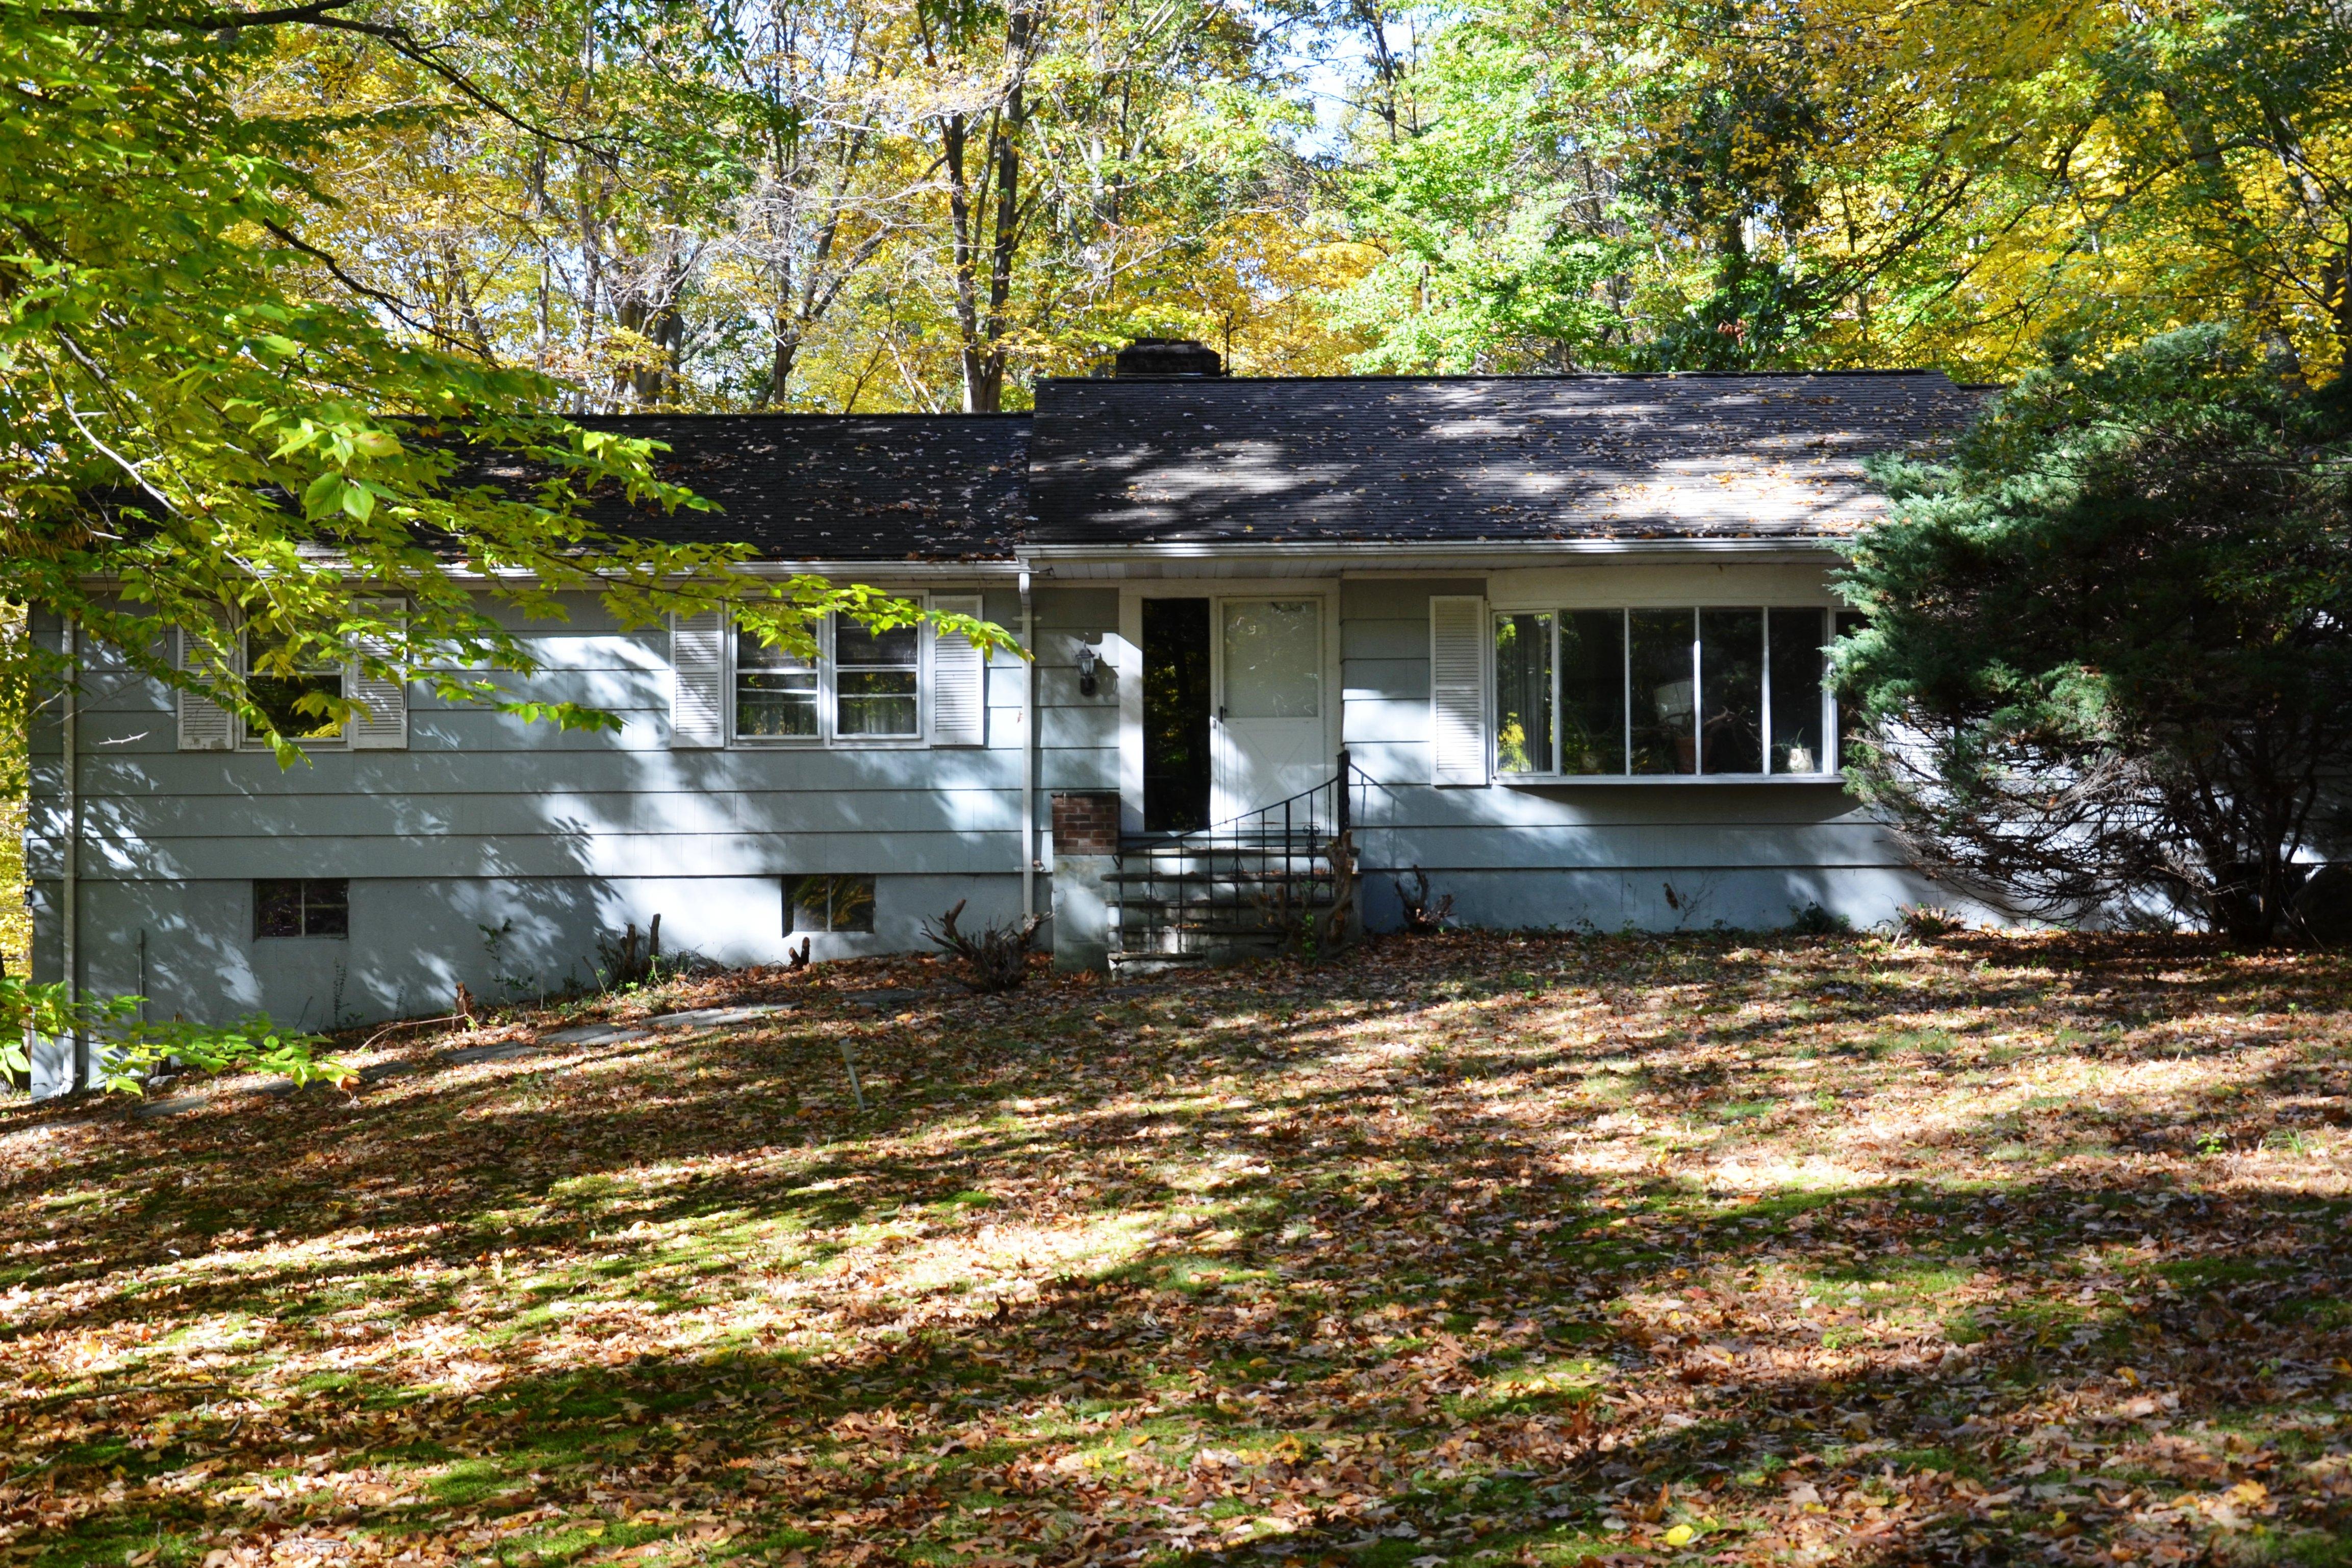 独户住宅 为 销售 在 Conveniently Located, Easy Commute 179-d East Rocks Road 诺瓦克, 康涅狄格州, 06851 美国